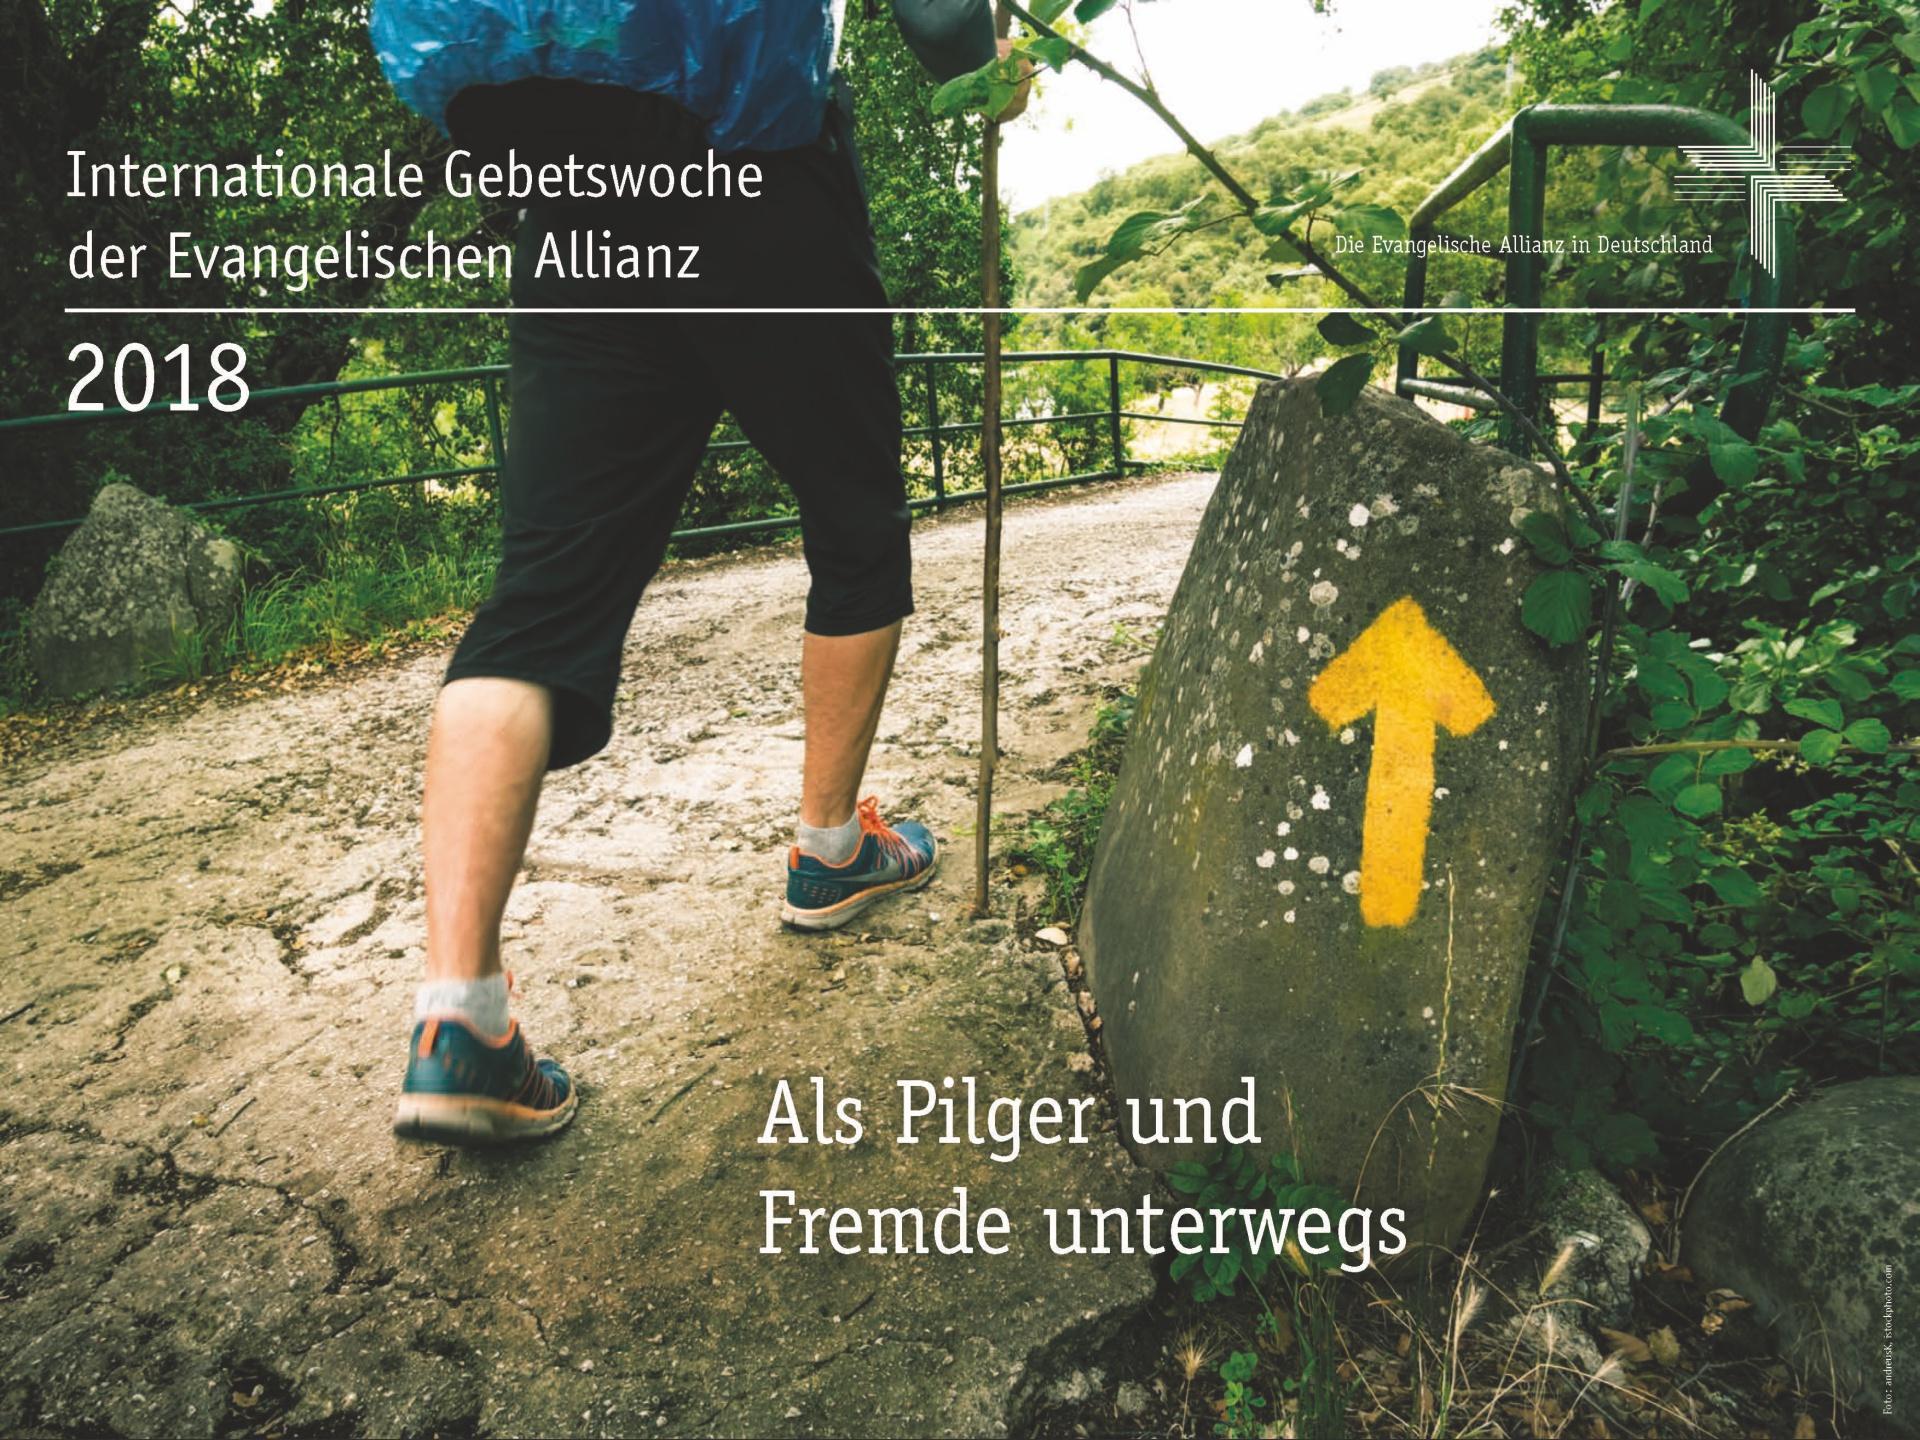 Allianzgebetswoche_2018_1